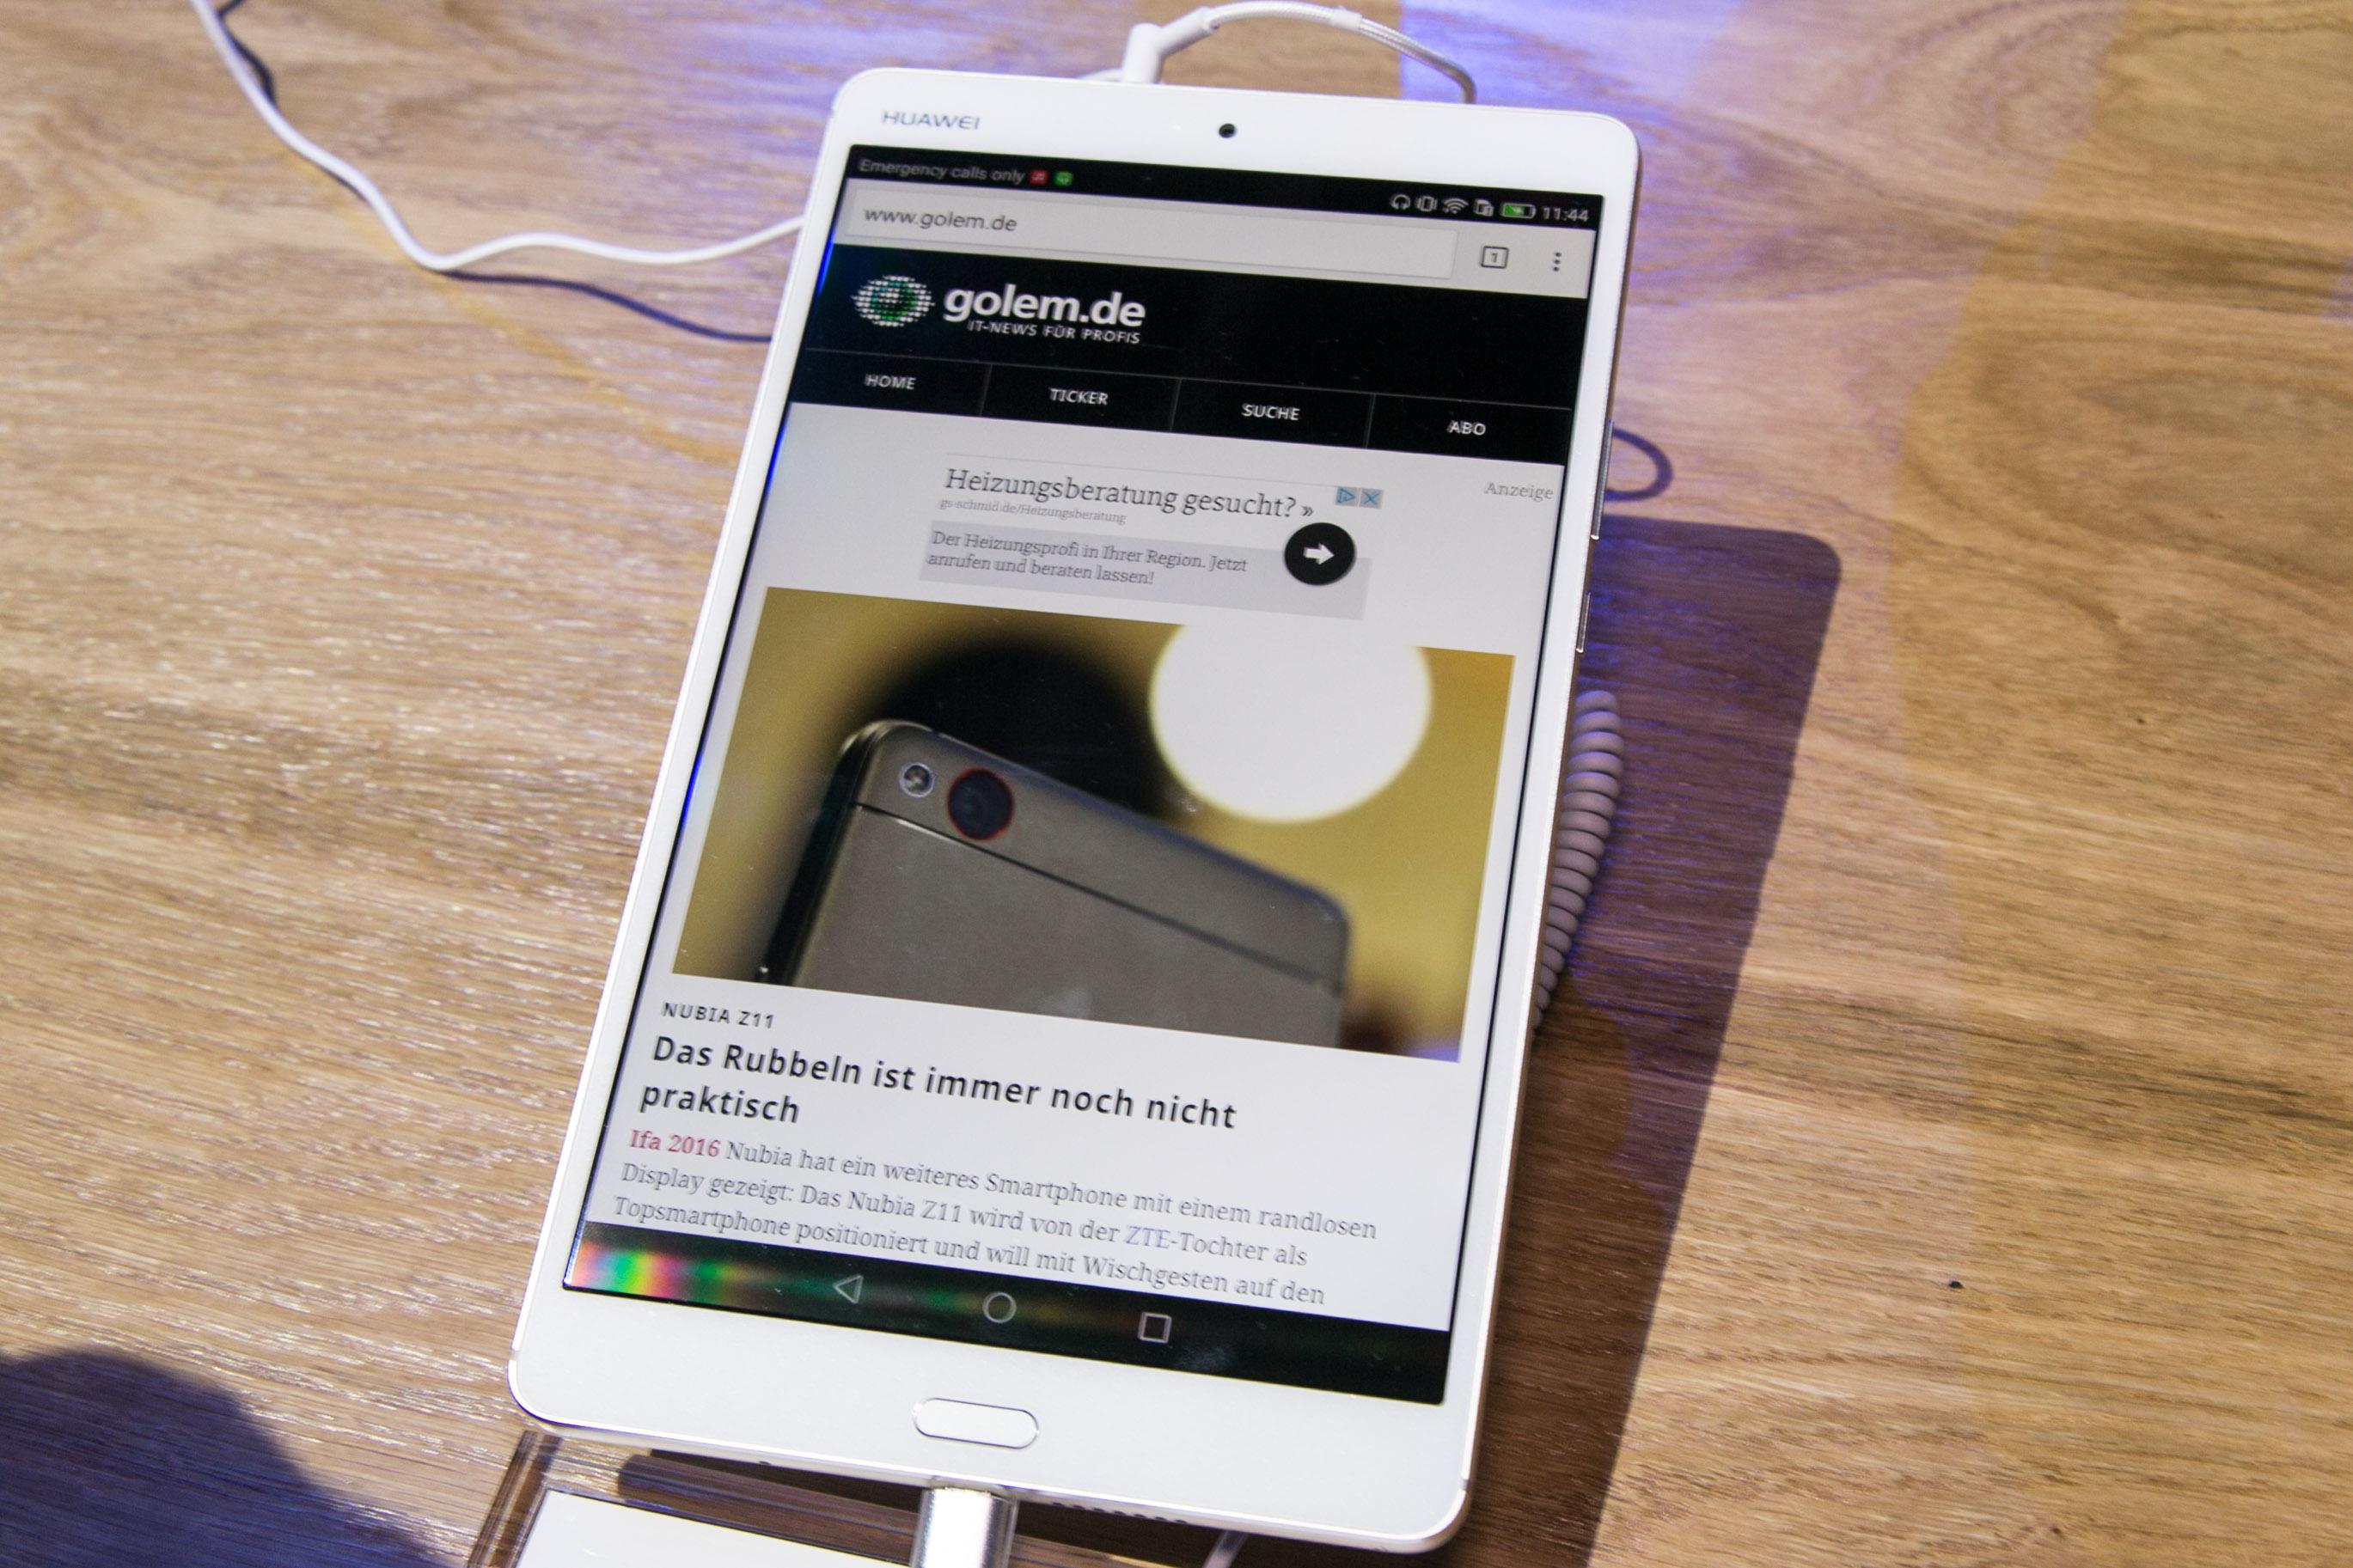 Mediapad M3: Huawei zeigt 8,4-Zoll-Tablet mit Fingerabdrucksensor - Huaweis Mediapad M3 (Bild: Martin Wolf/Golem.de)